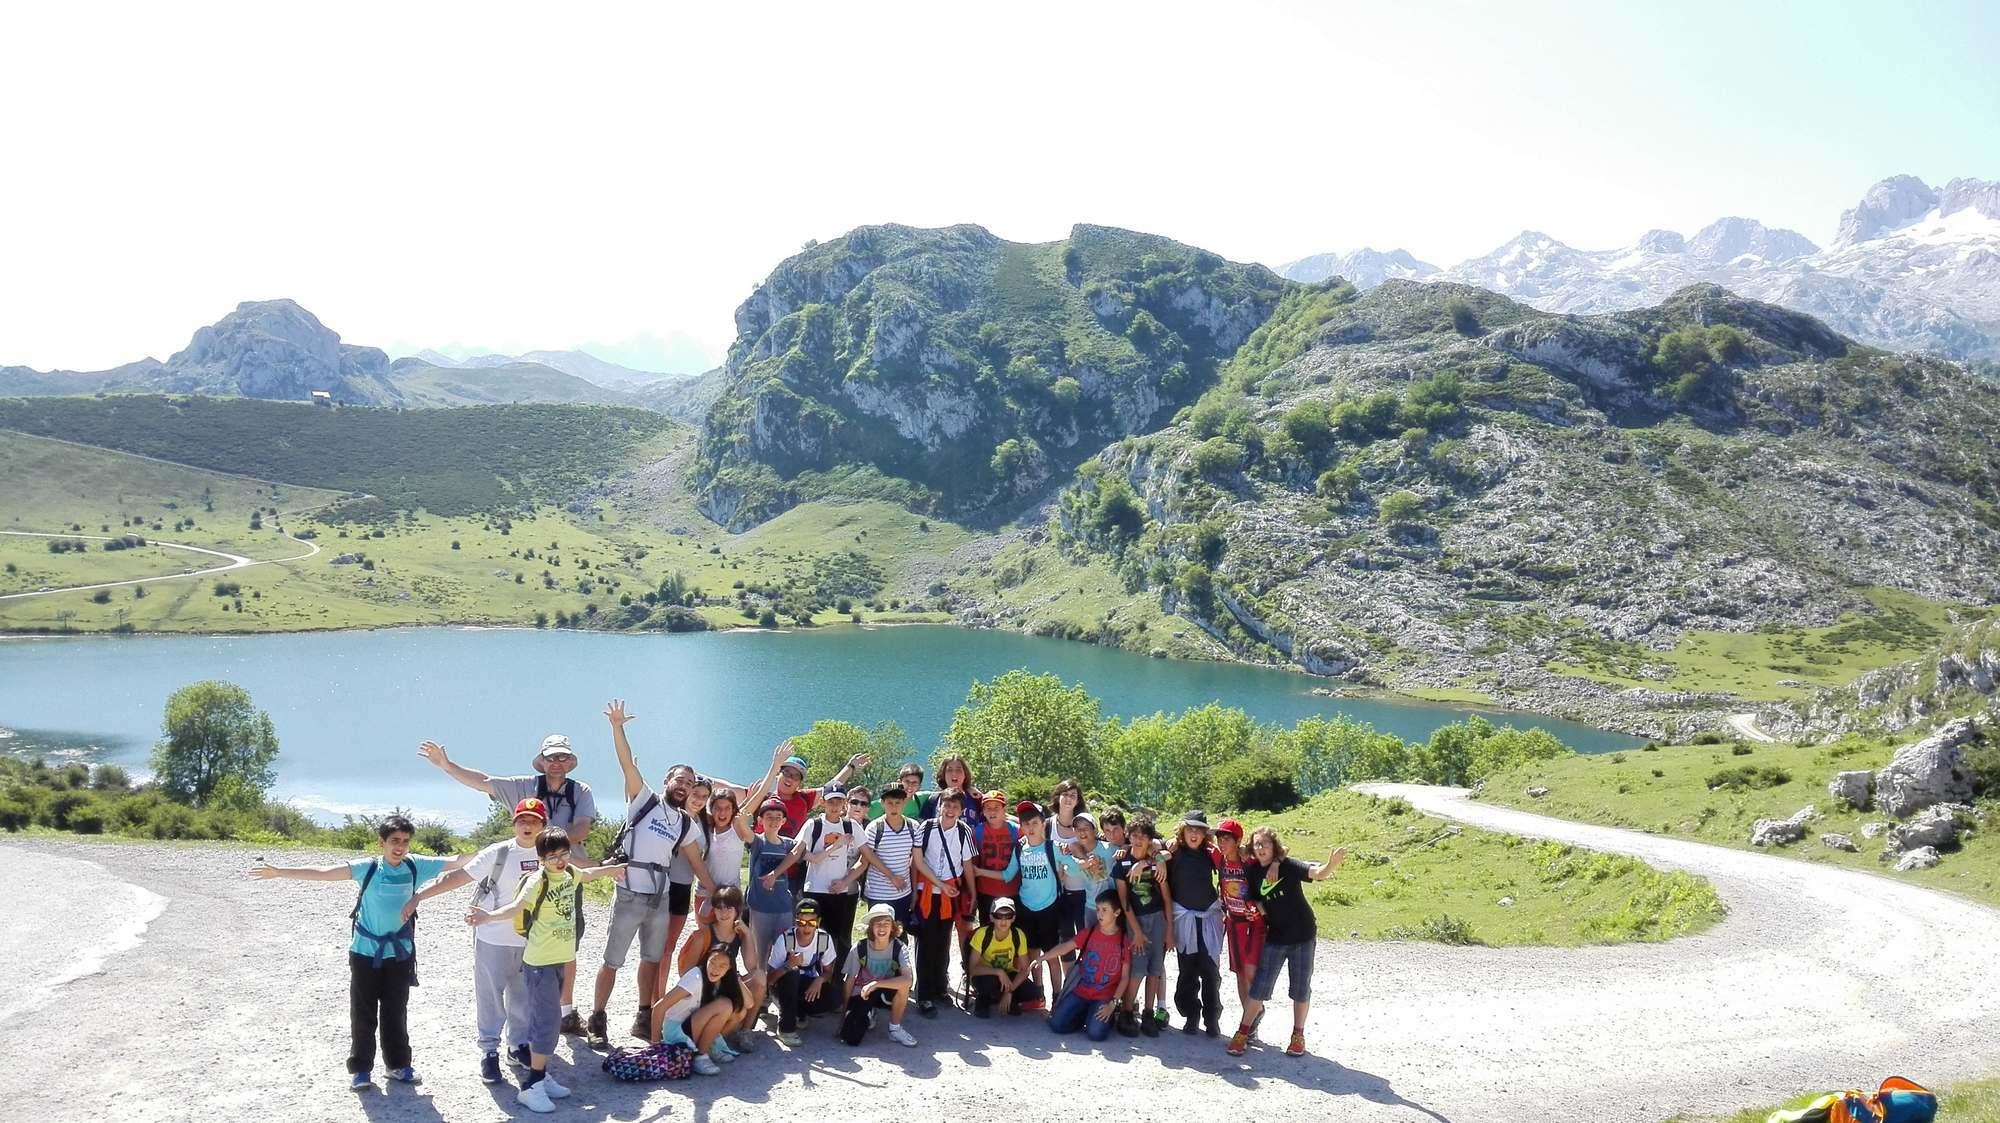 Viaje fin de curso a Asturias con monitores 24 h